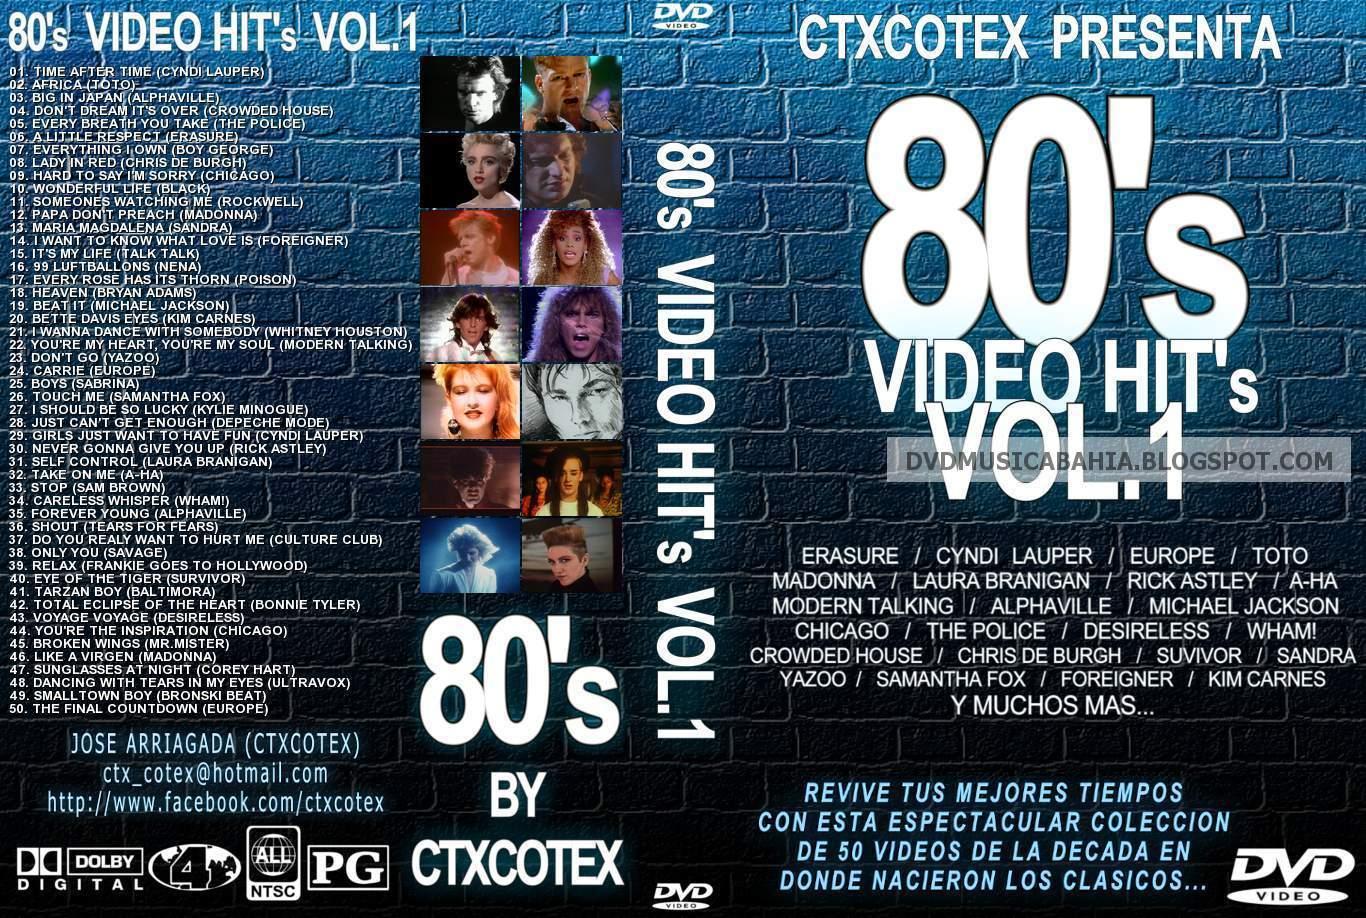 Los mejores dvd de musica y mas 80s video hits for Classic 90s house vol 2